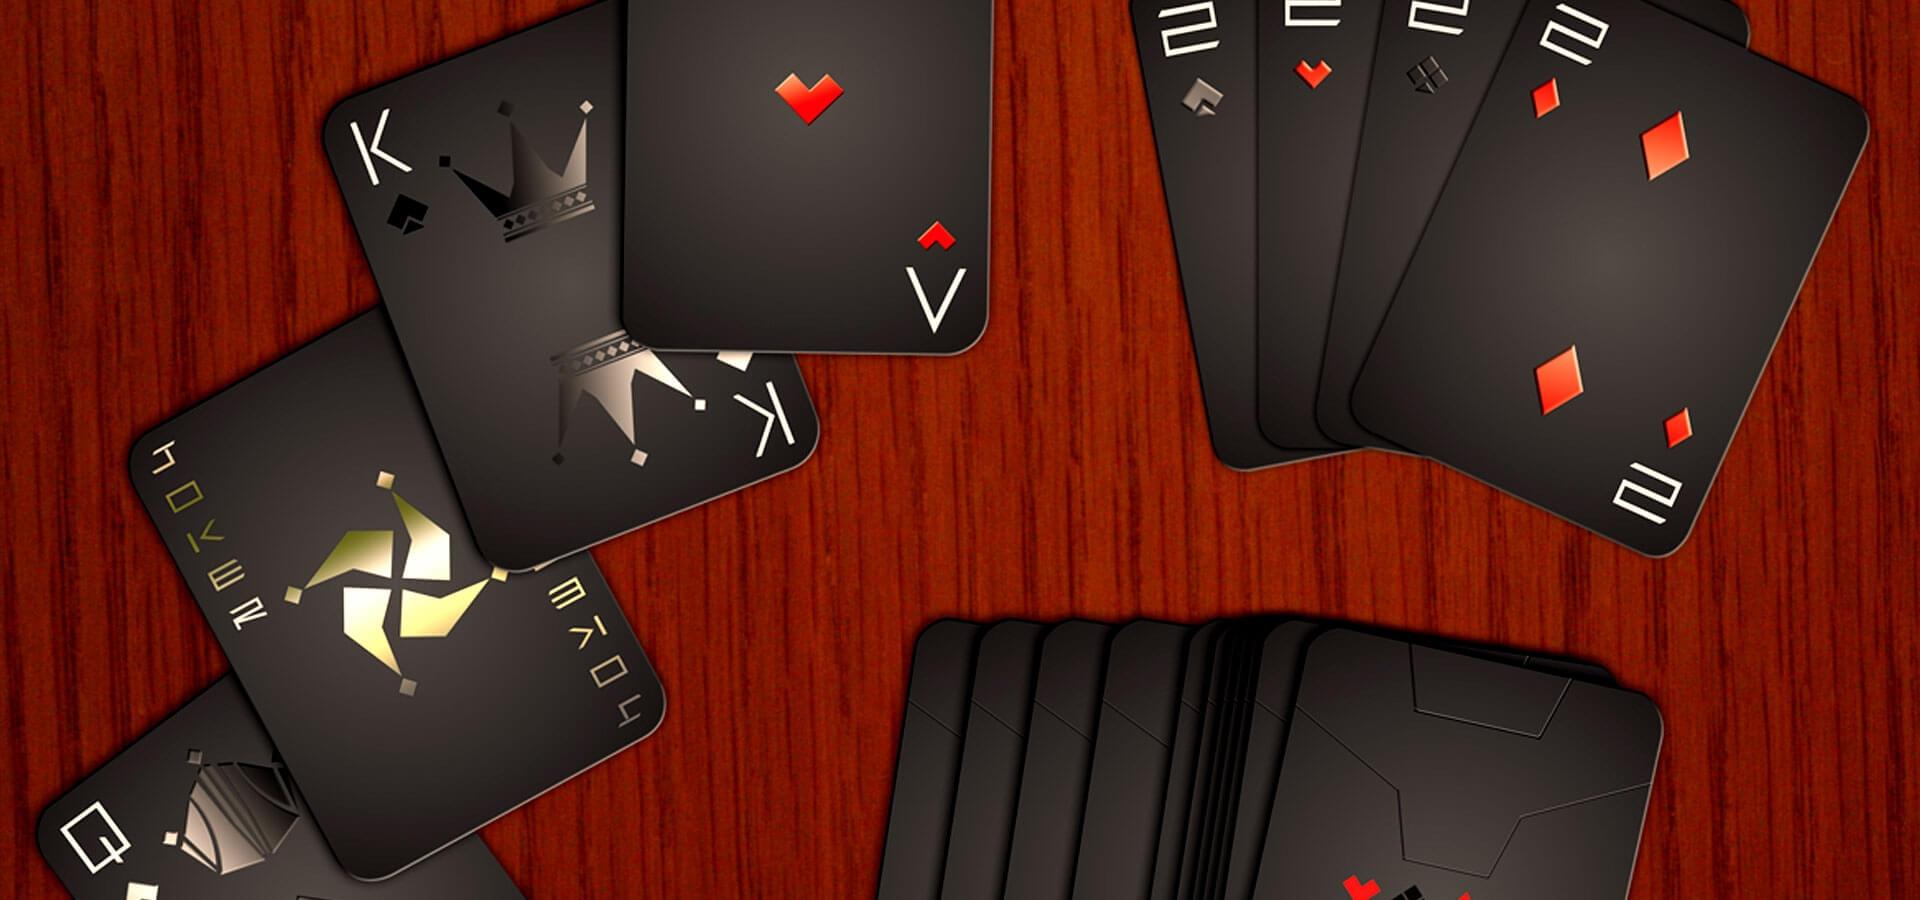 22+ Playing Card Designs | Free & Premium Templates For Playing Card Design Template